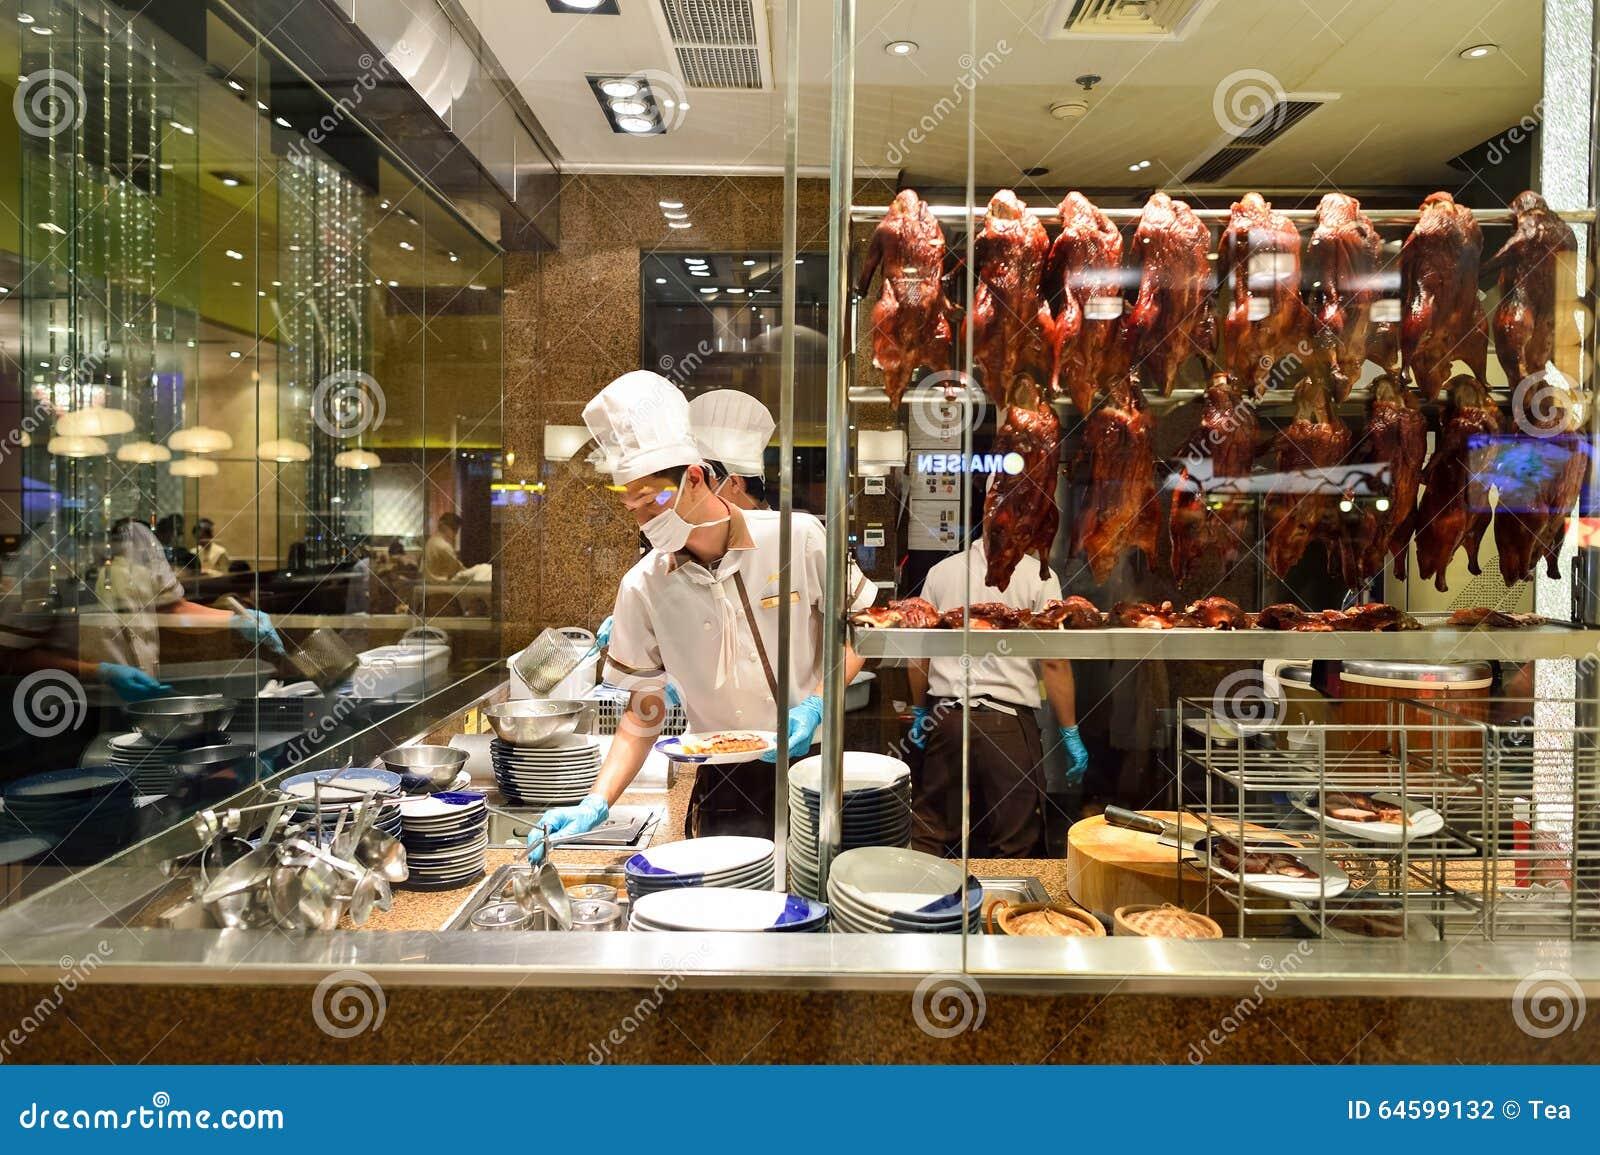 food court restaurant business plan